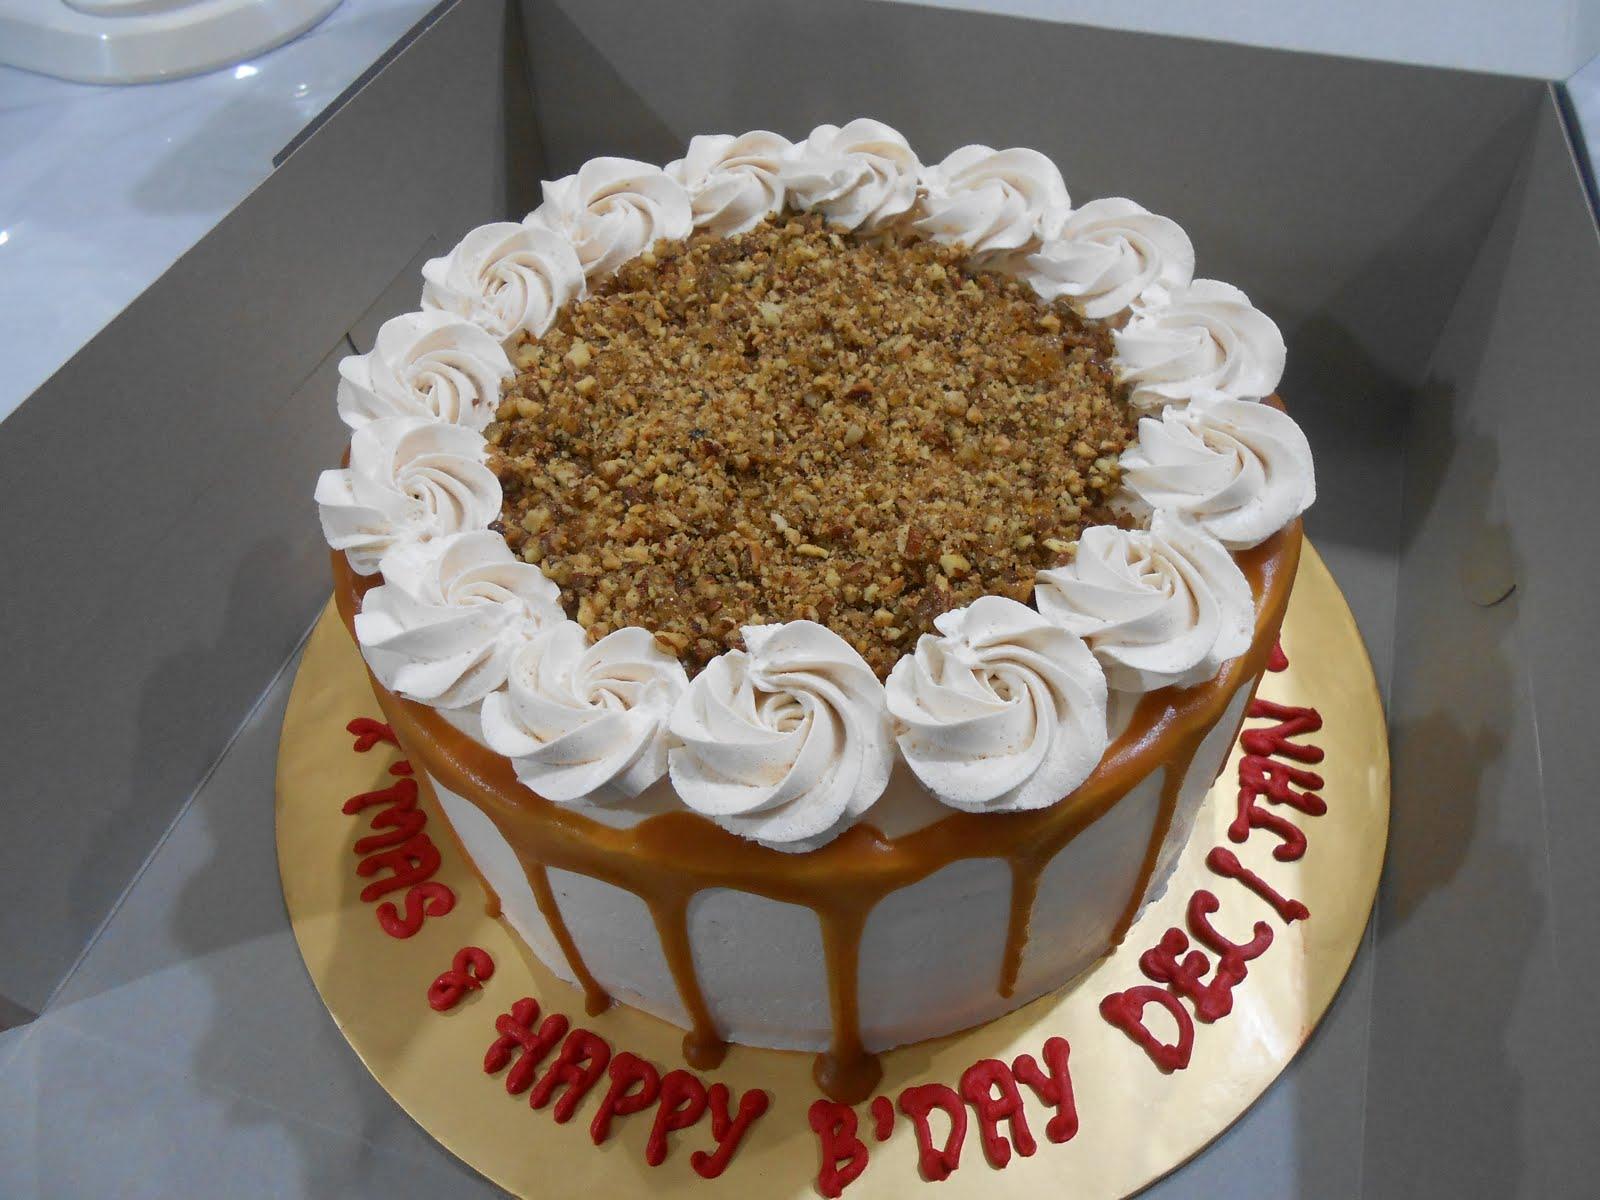 PECAN BSCOTCH CAKE